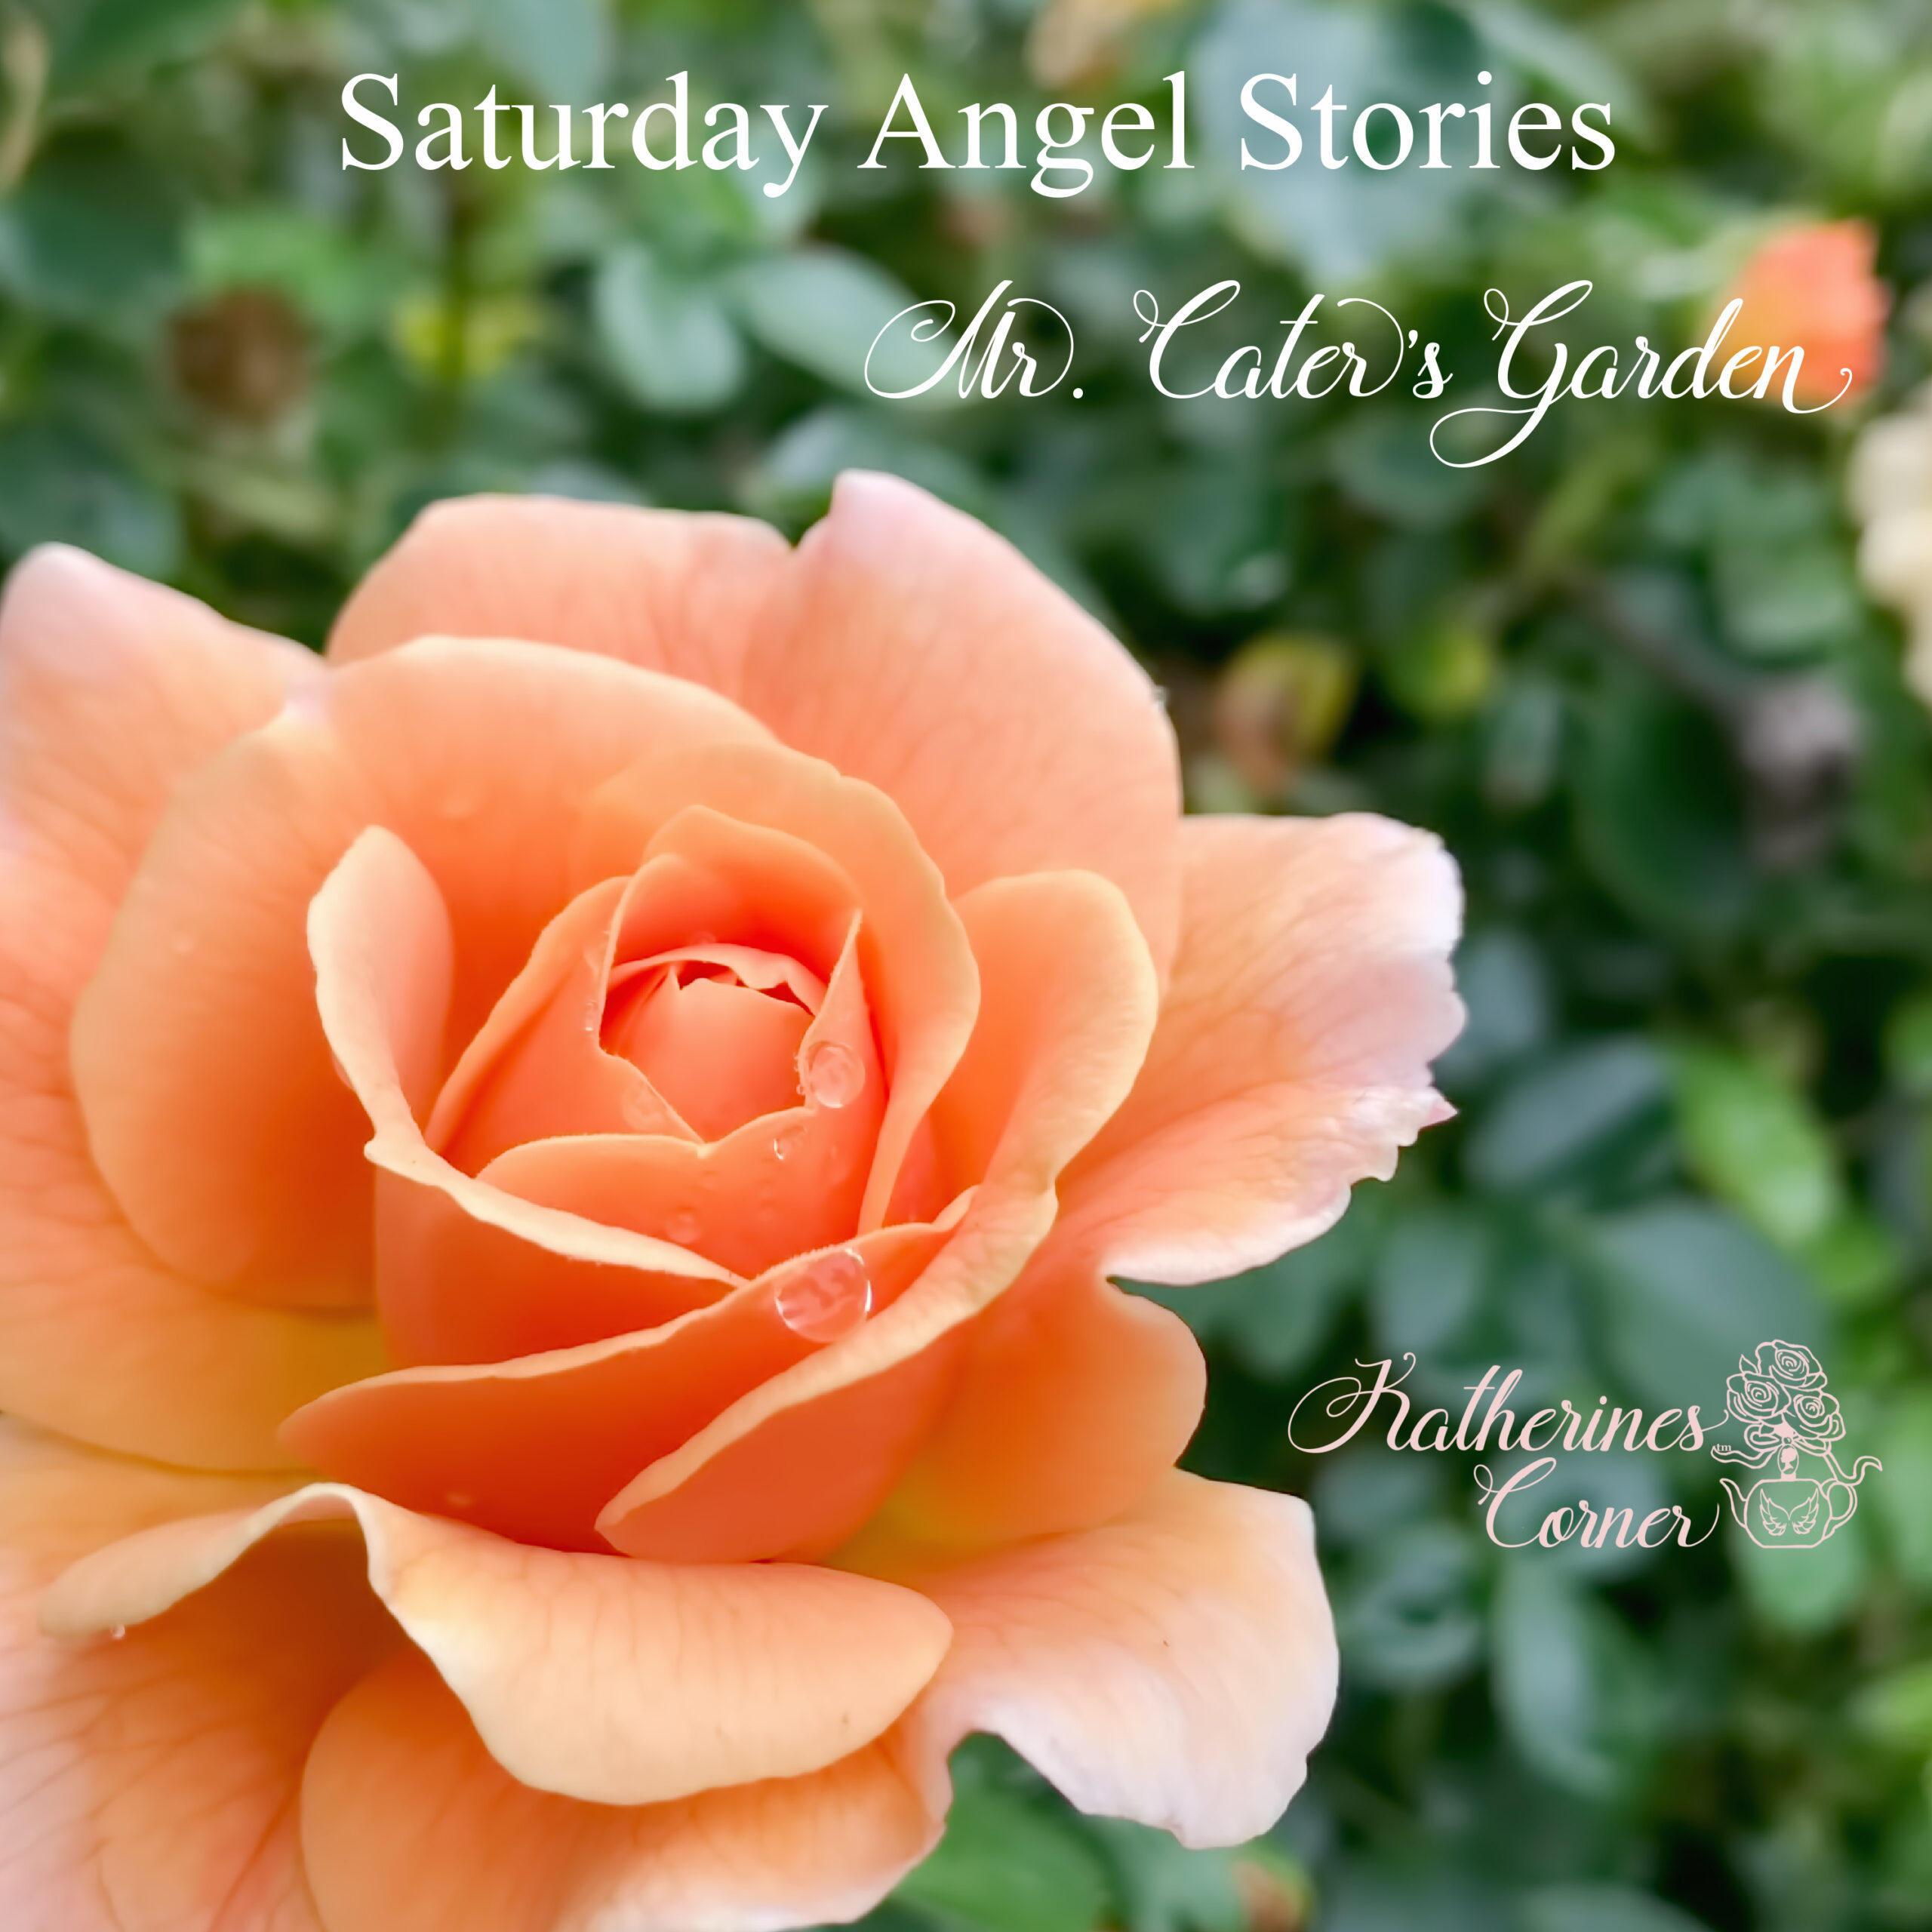 Saturday Angel Stories Mr. Caters Garden